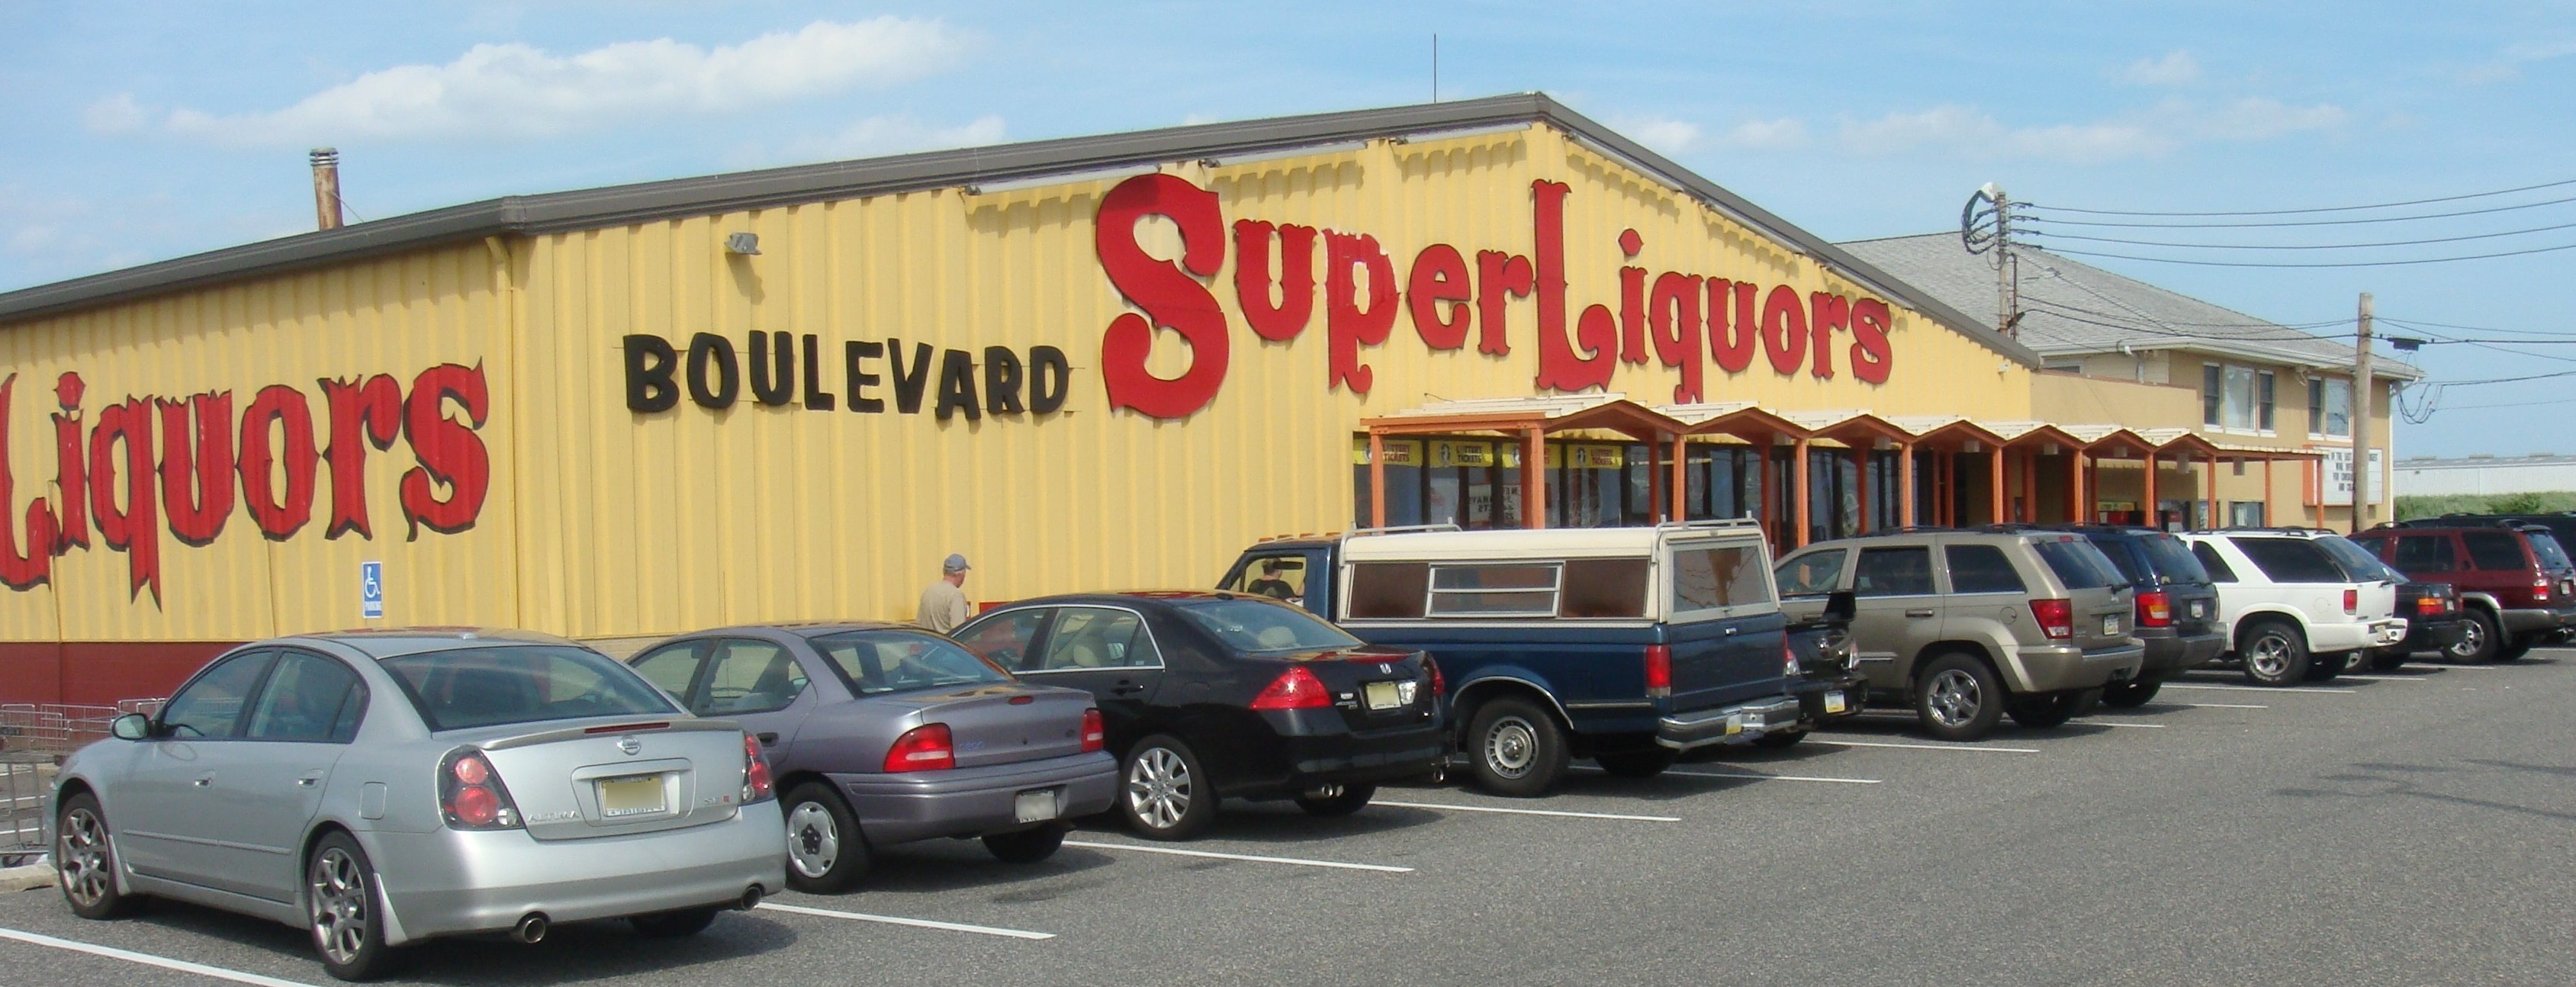 Off-Premise Spotlight: Boulevard Super Liquors